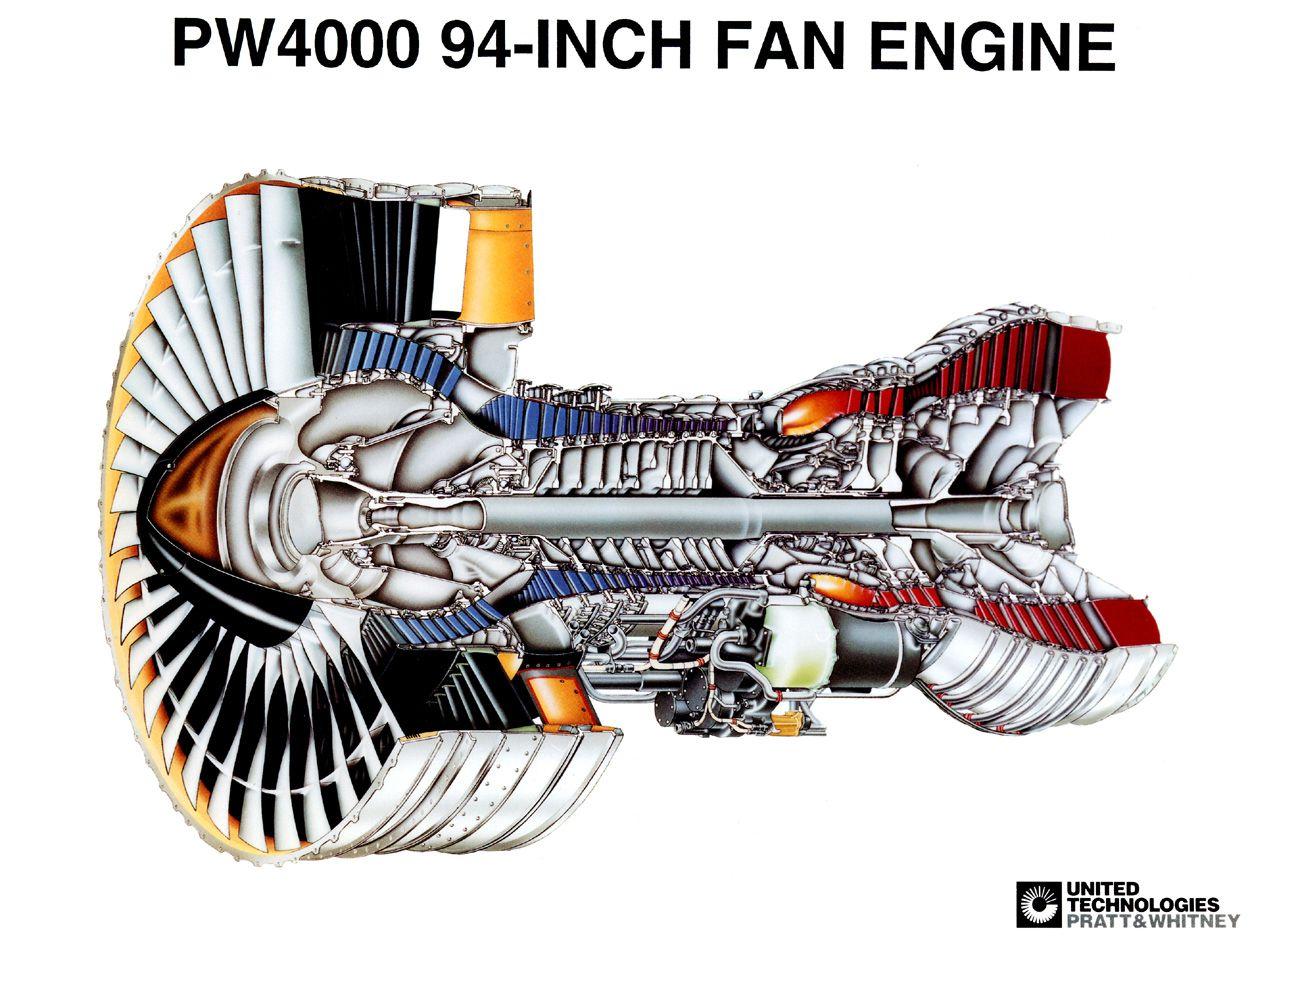 Pratt & Whitney and Boeing Representatives Sign Engine